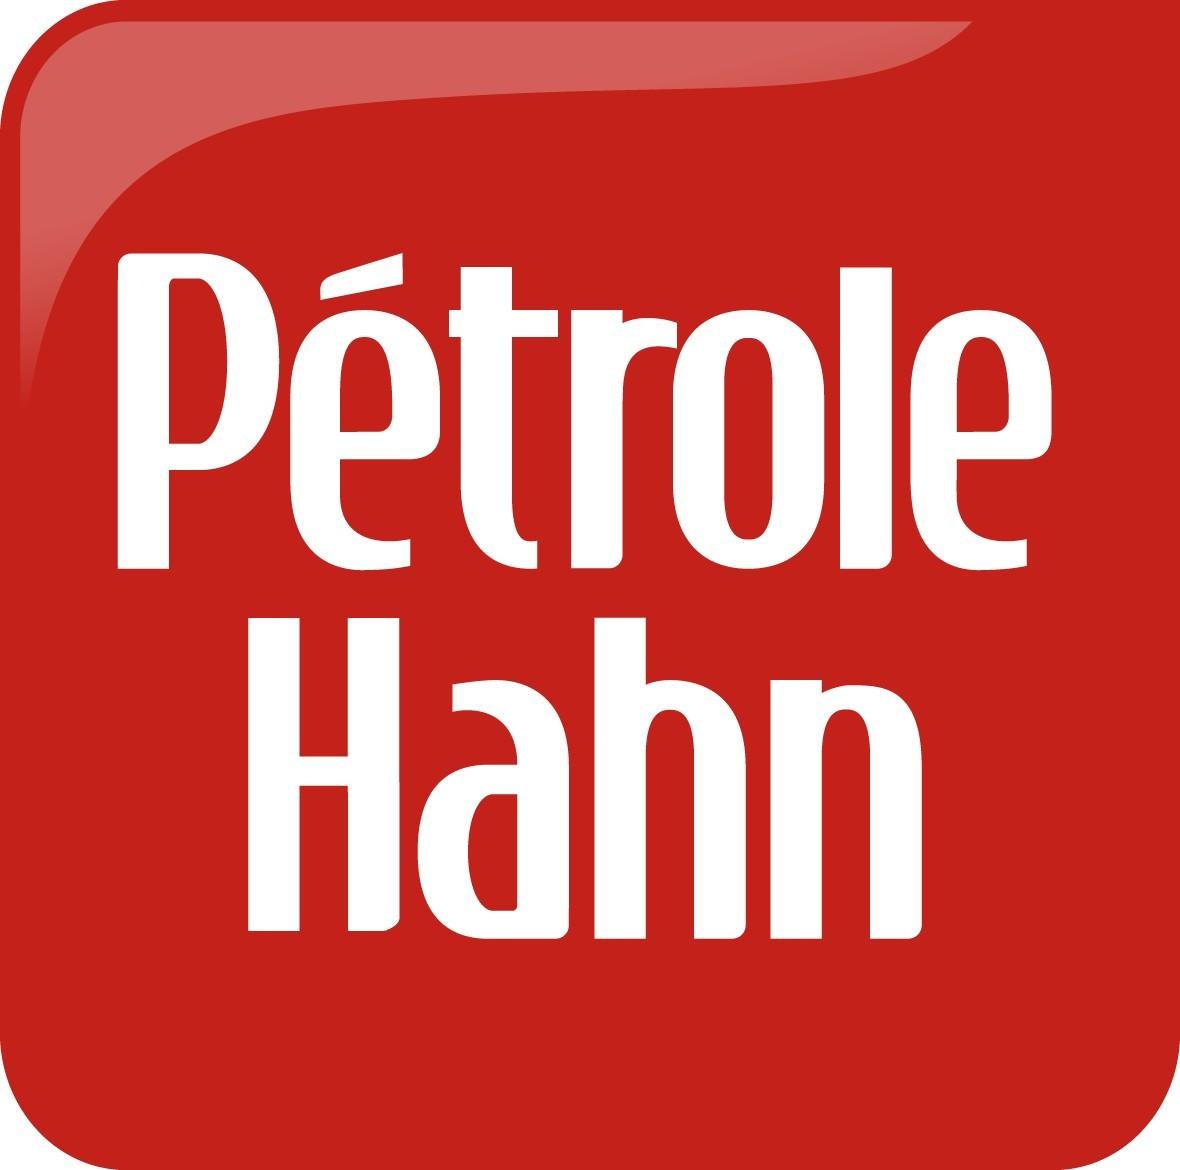 Petrole Hahn